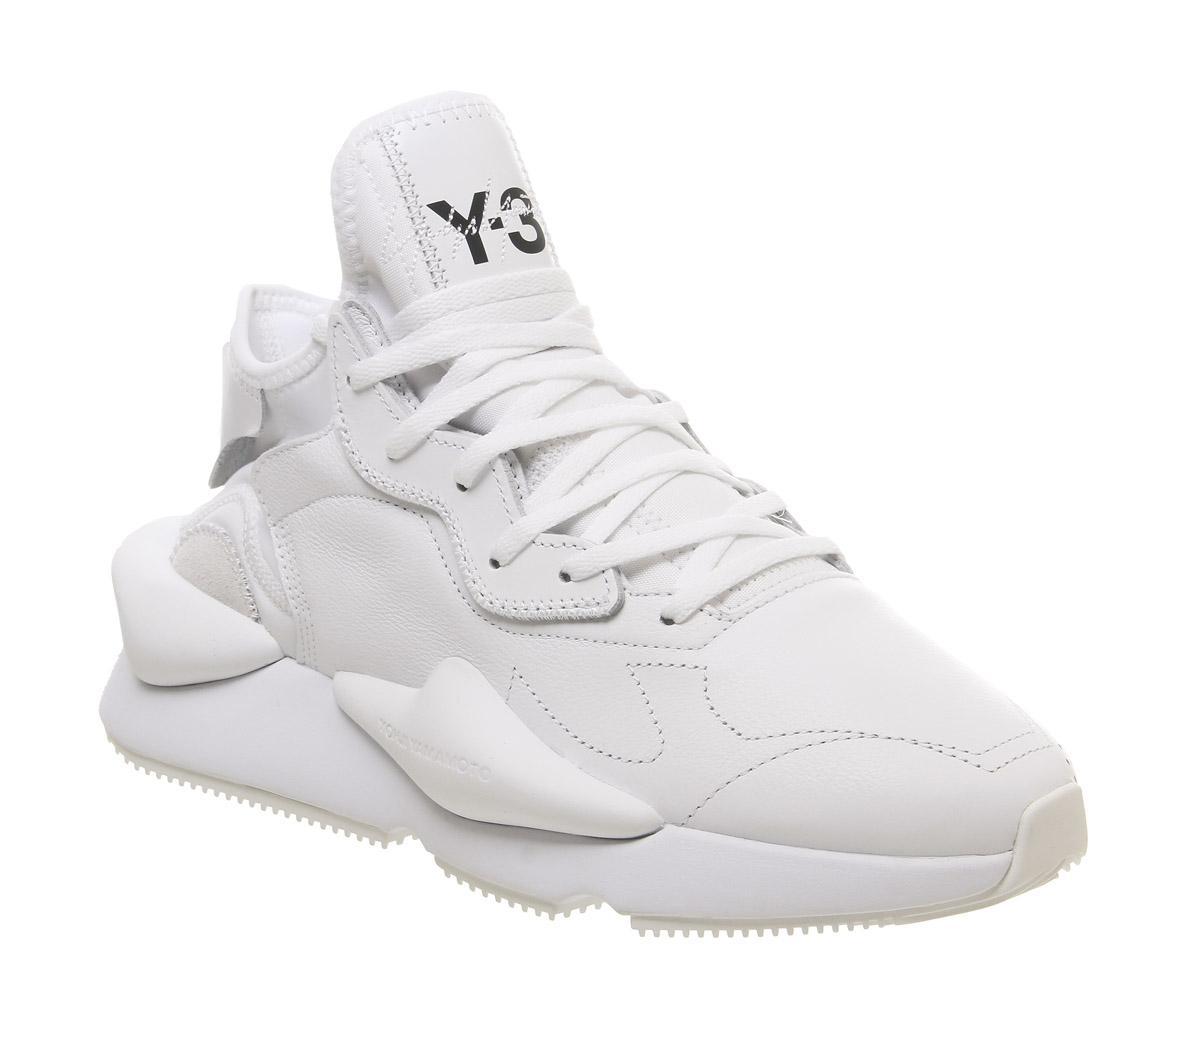 adidas Y3 Y3 Kaiwa Trainers White